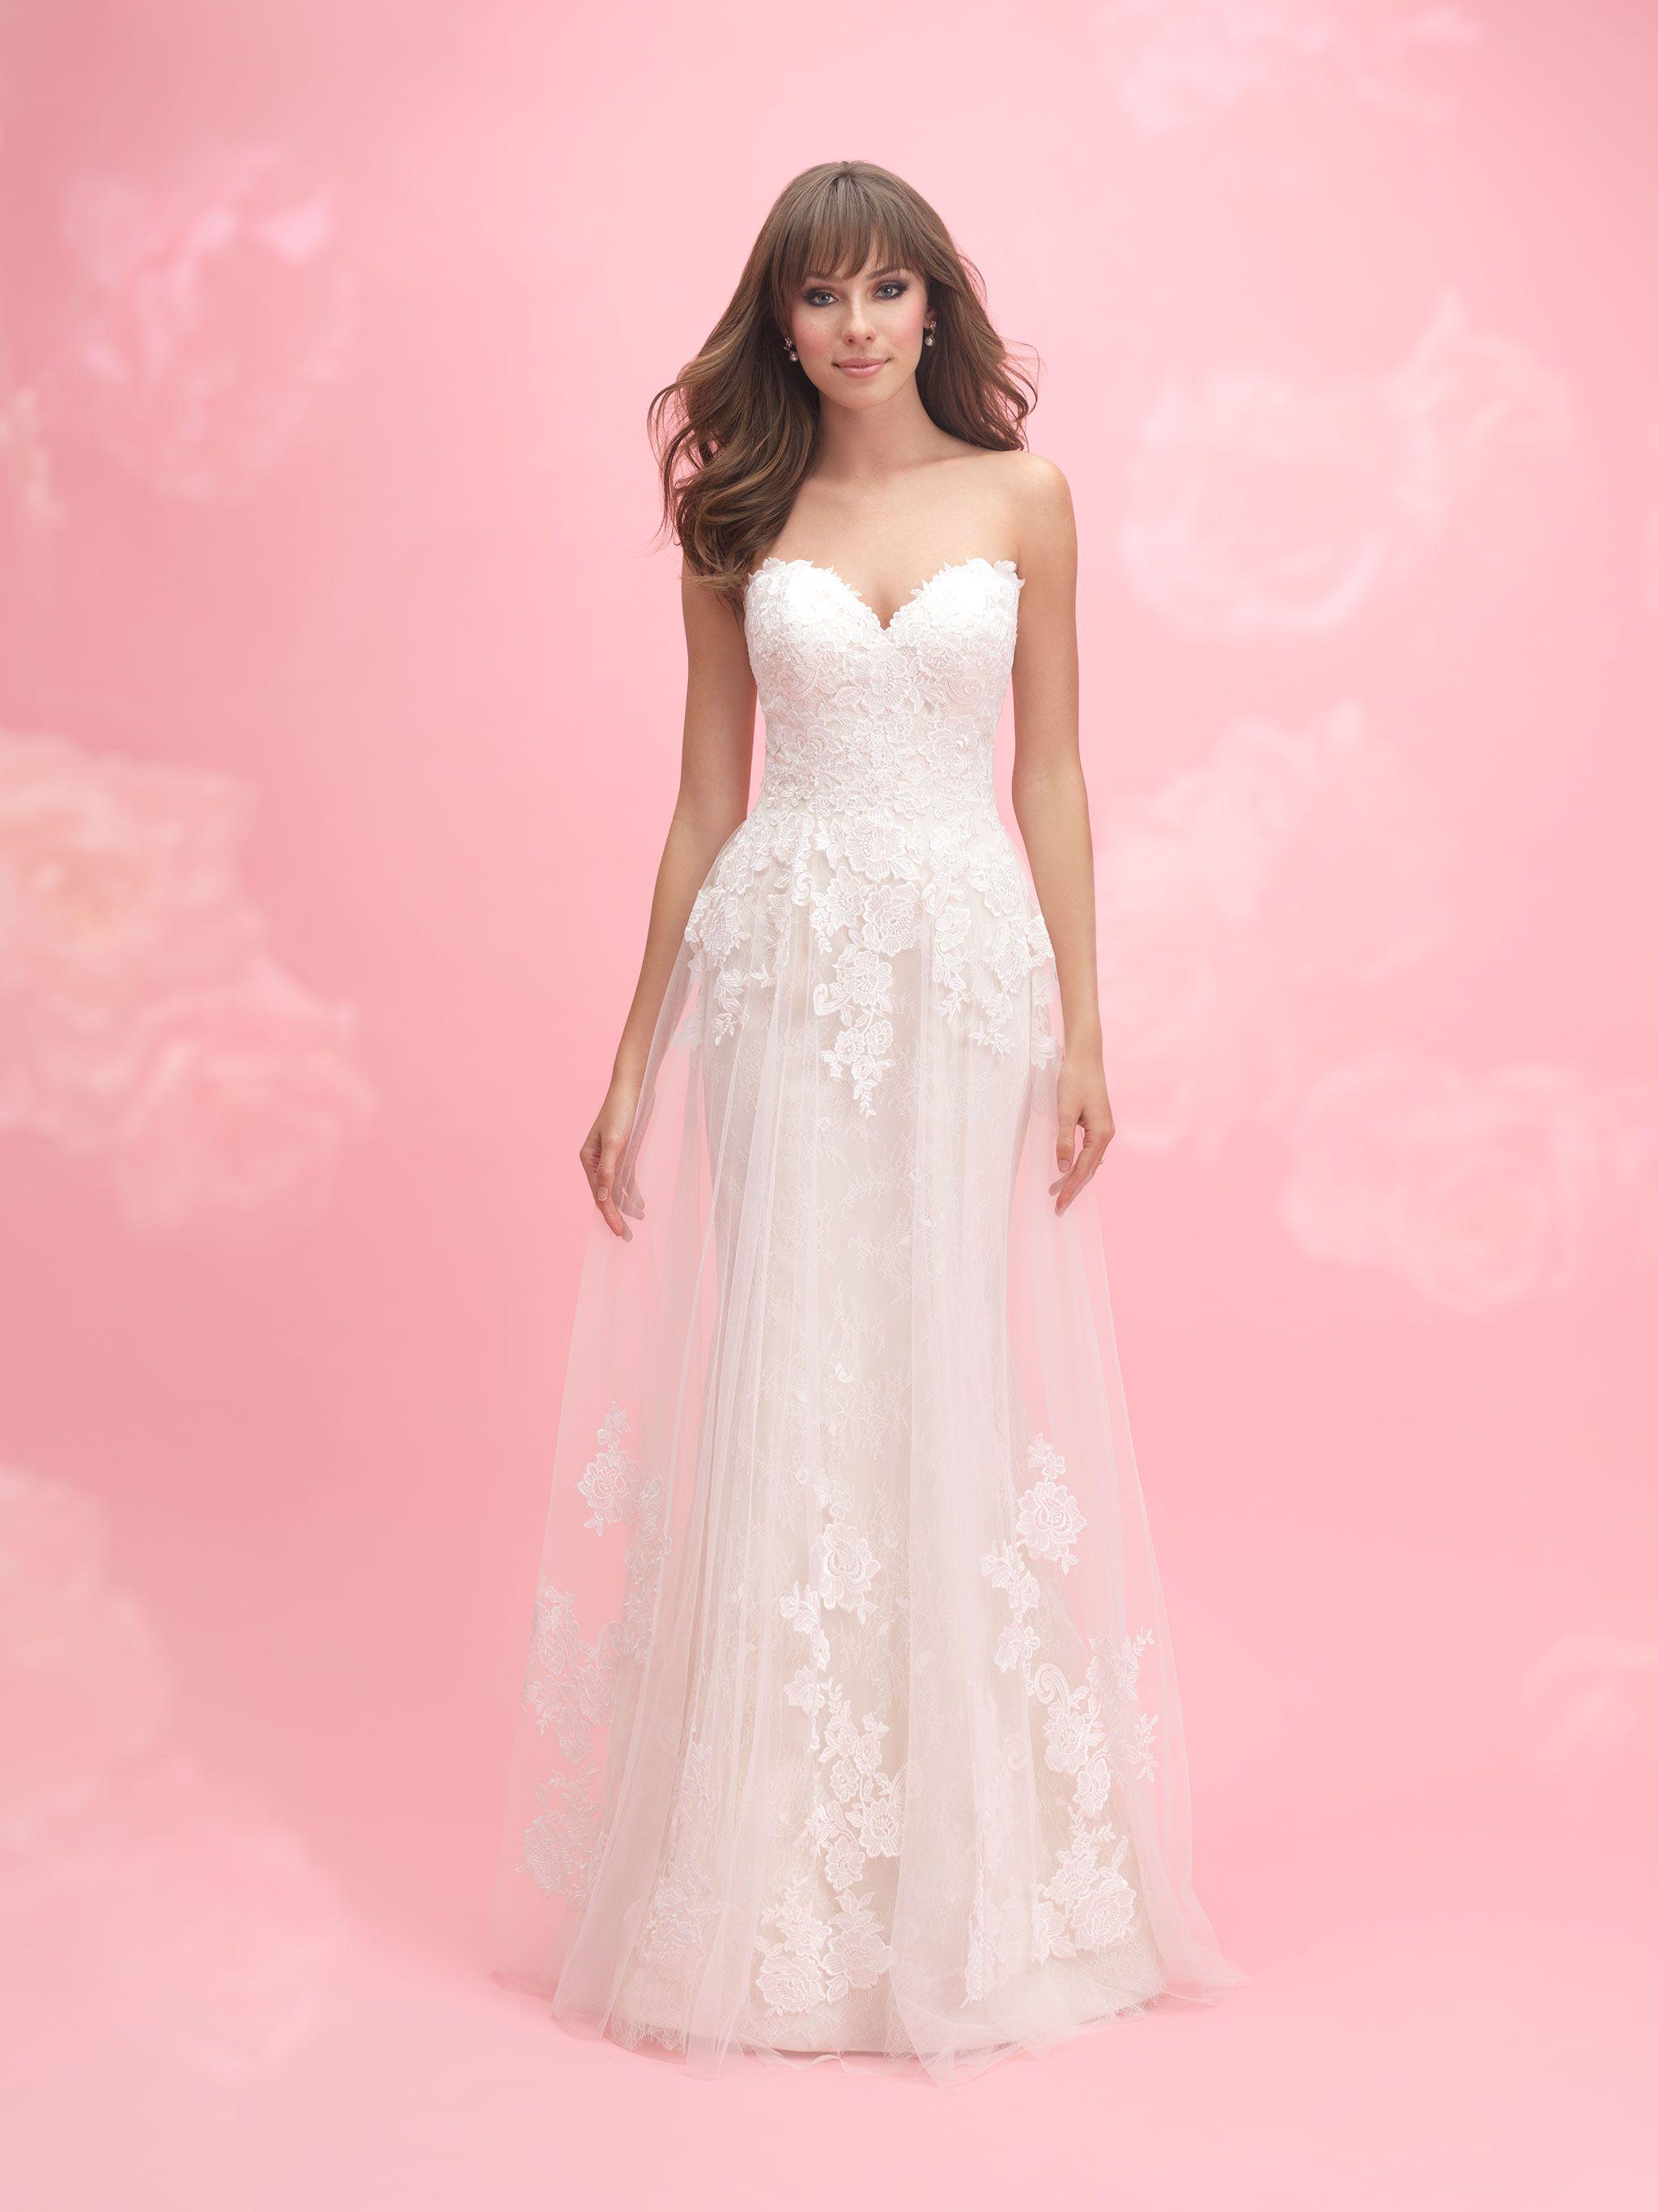 Pin de Audras Bridal en Wedding Gowns in Store | Pinterest